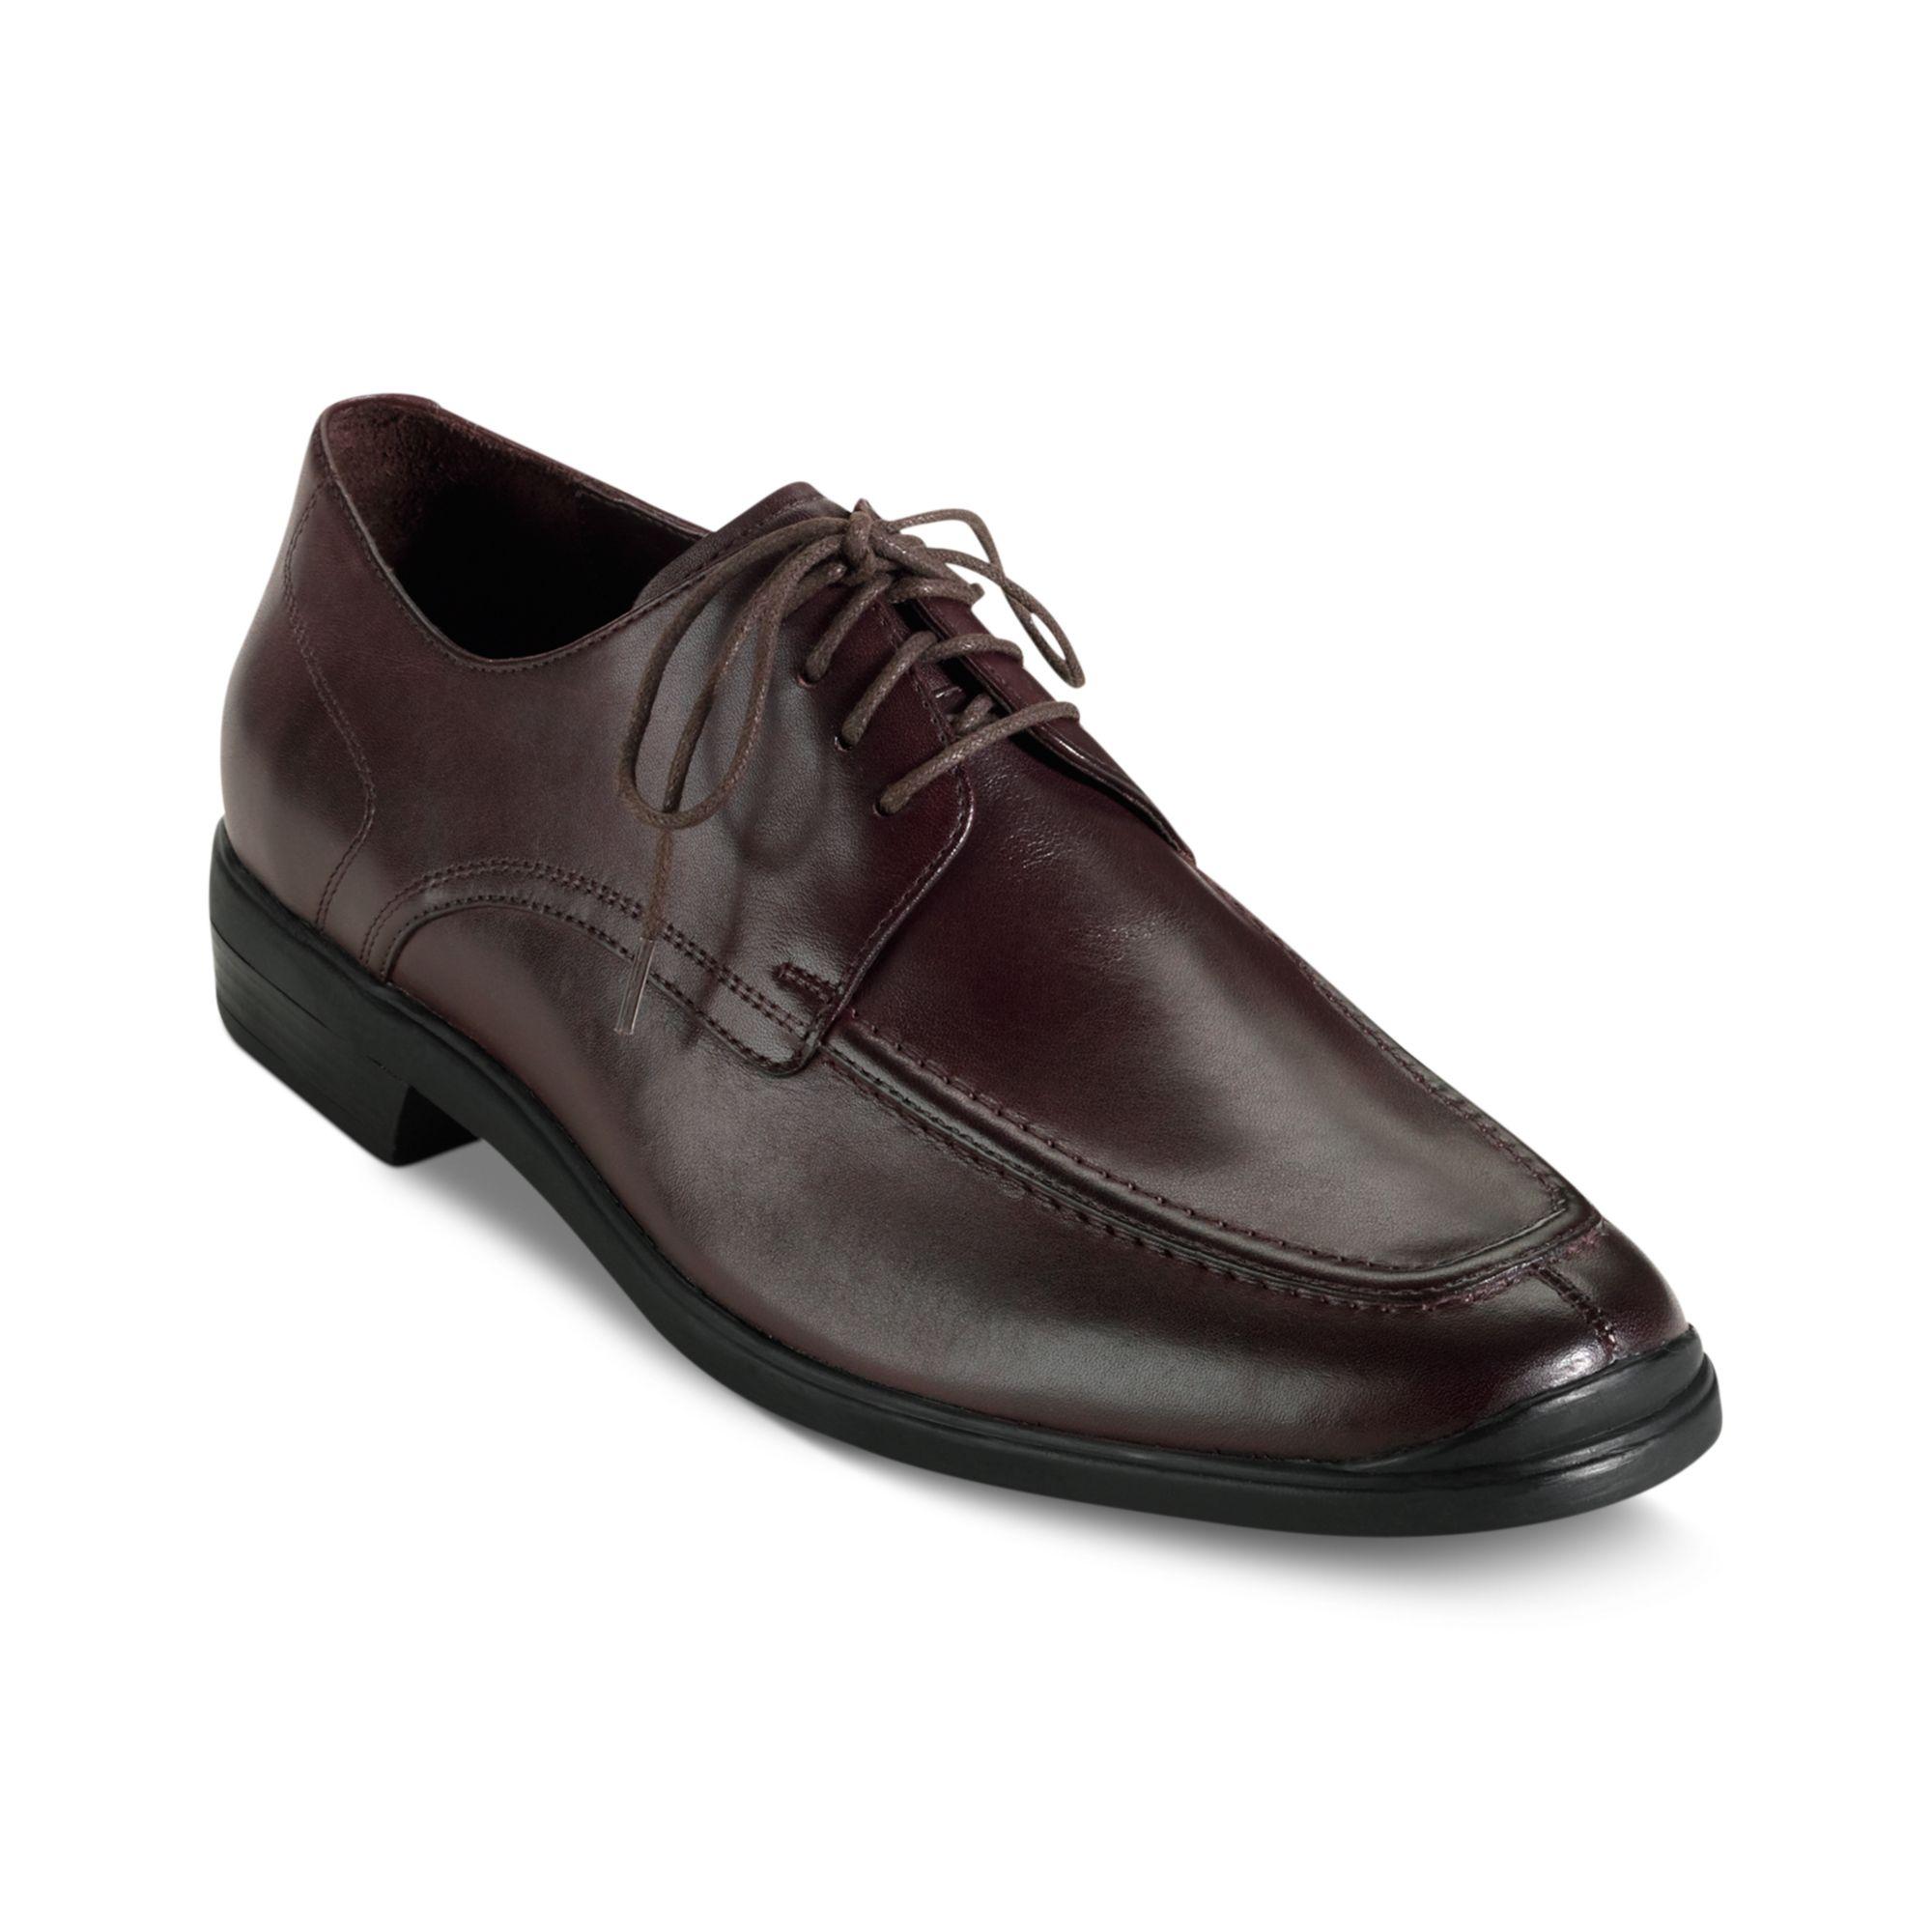 Kenneth Cole Fashion Designer Shoes